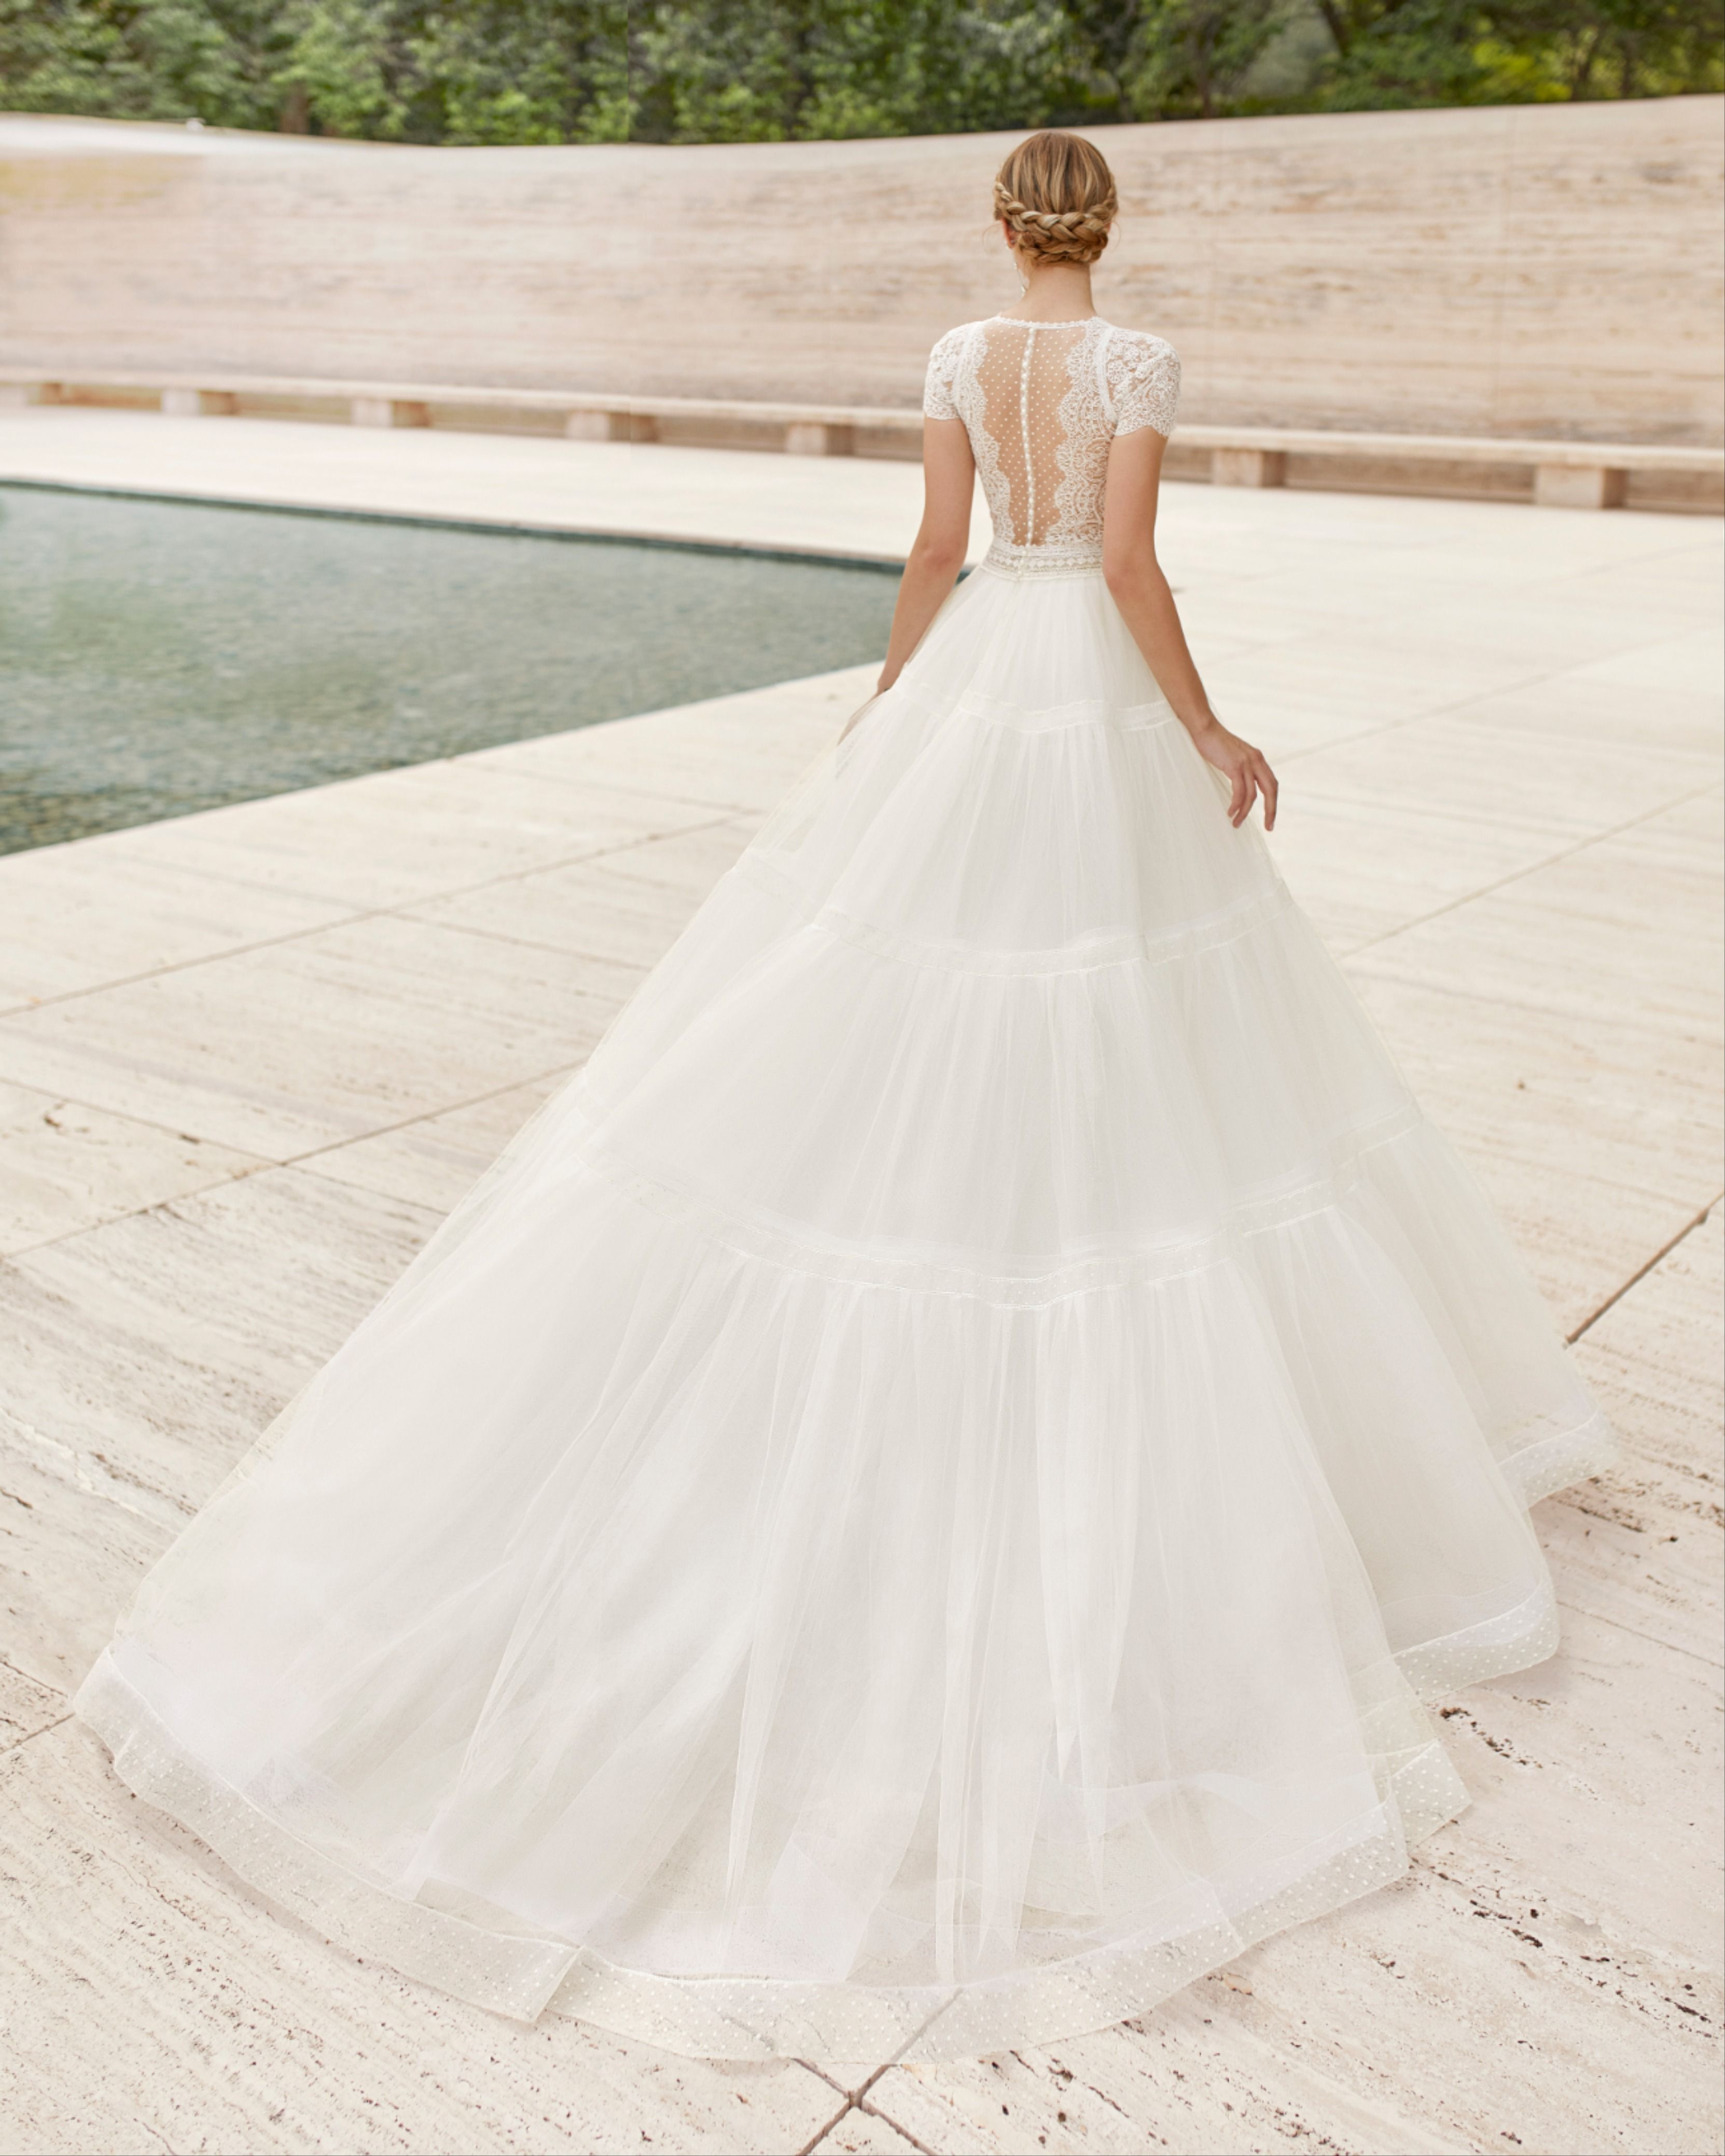 Erika By Rosa Clara Princess Style Wedding Dresses Wedding Dresses Princess Wedding Dress [ 4157 x 3326 Pixel ]